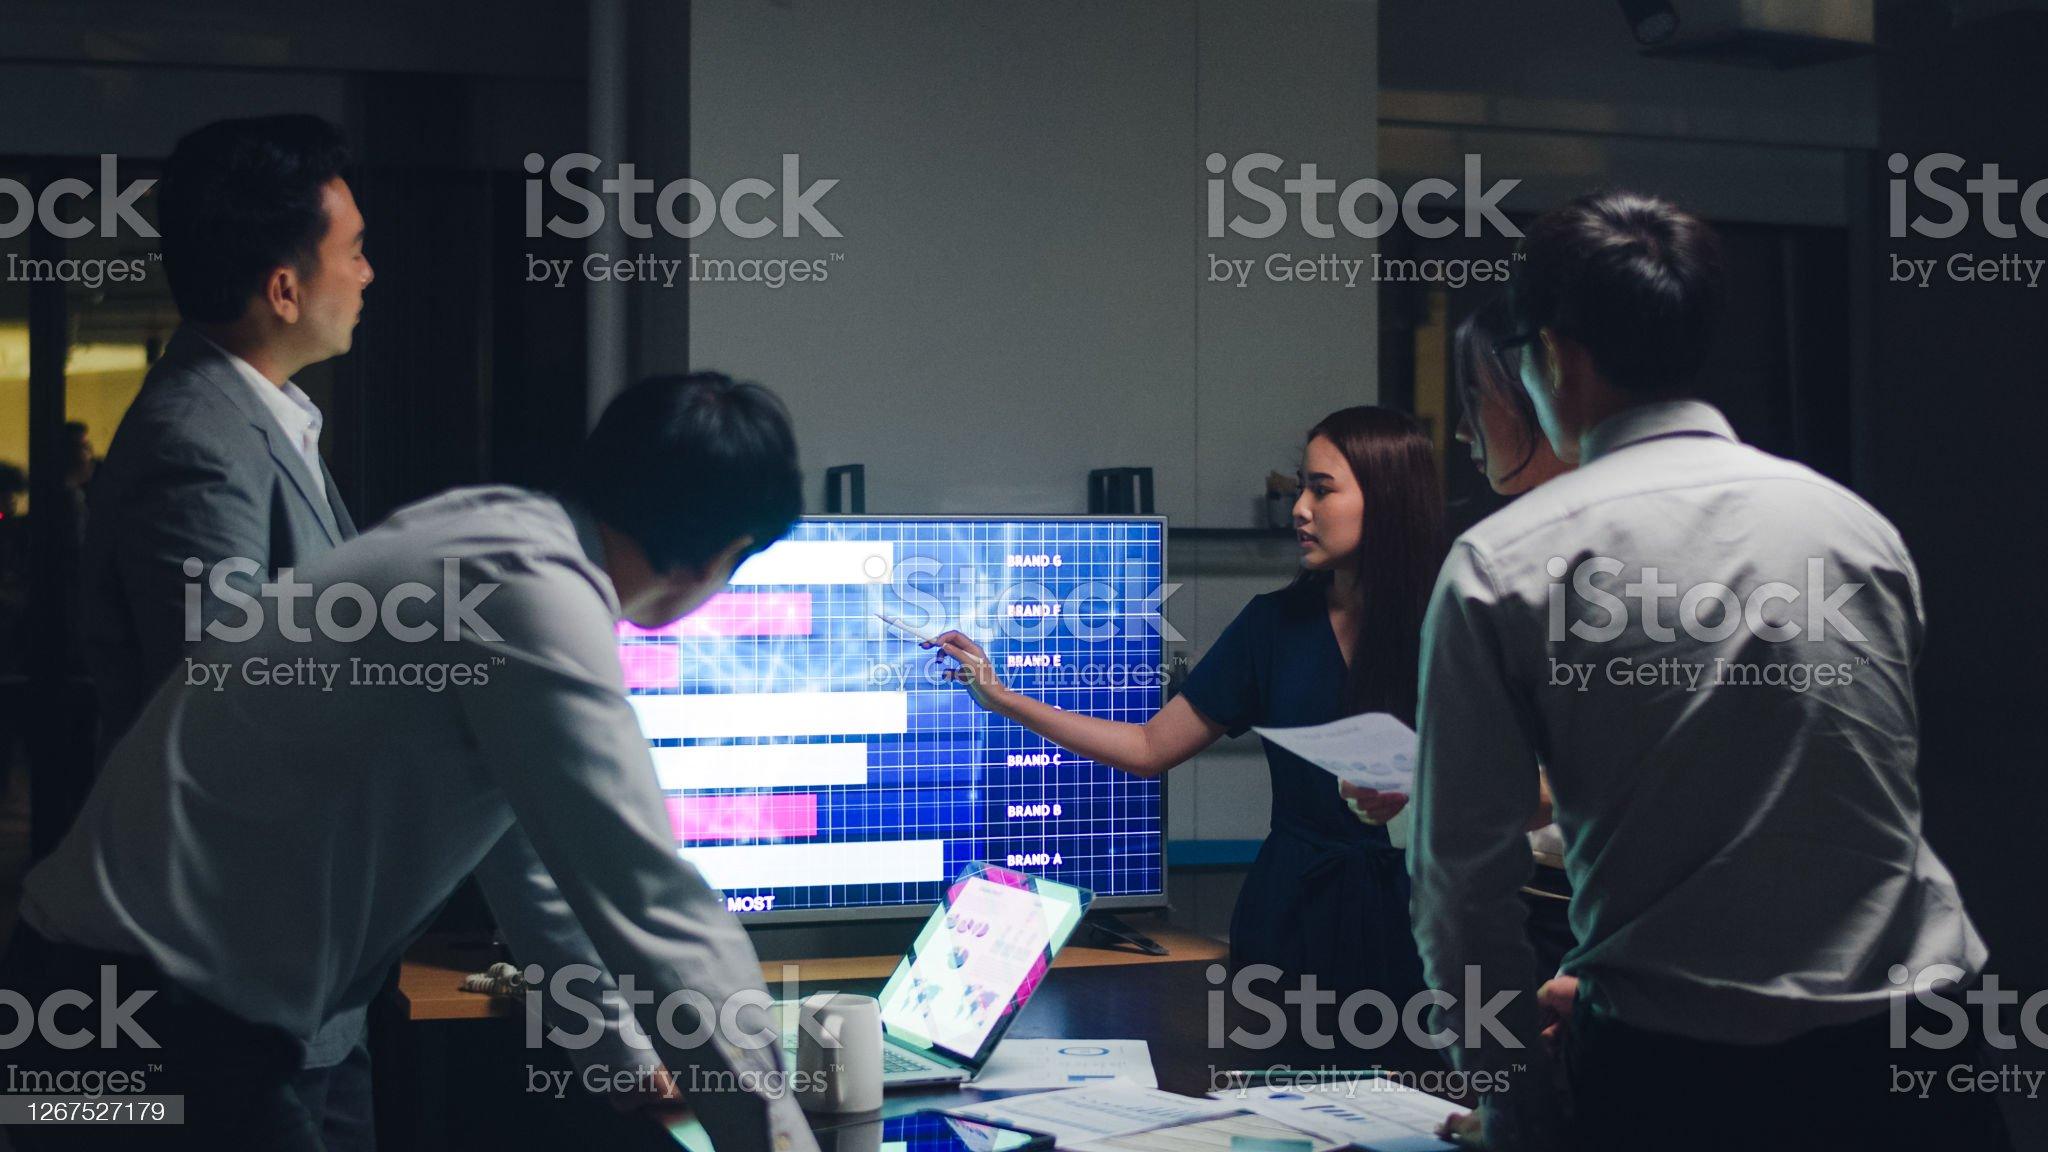 Nightclub business plan algebra editor for hire